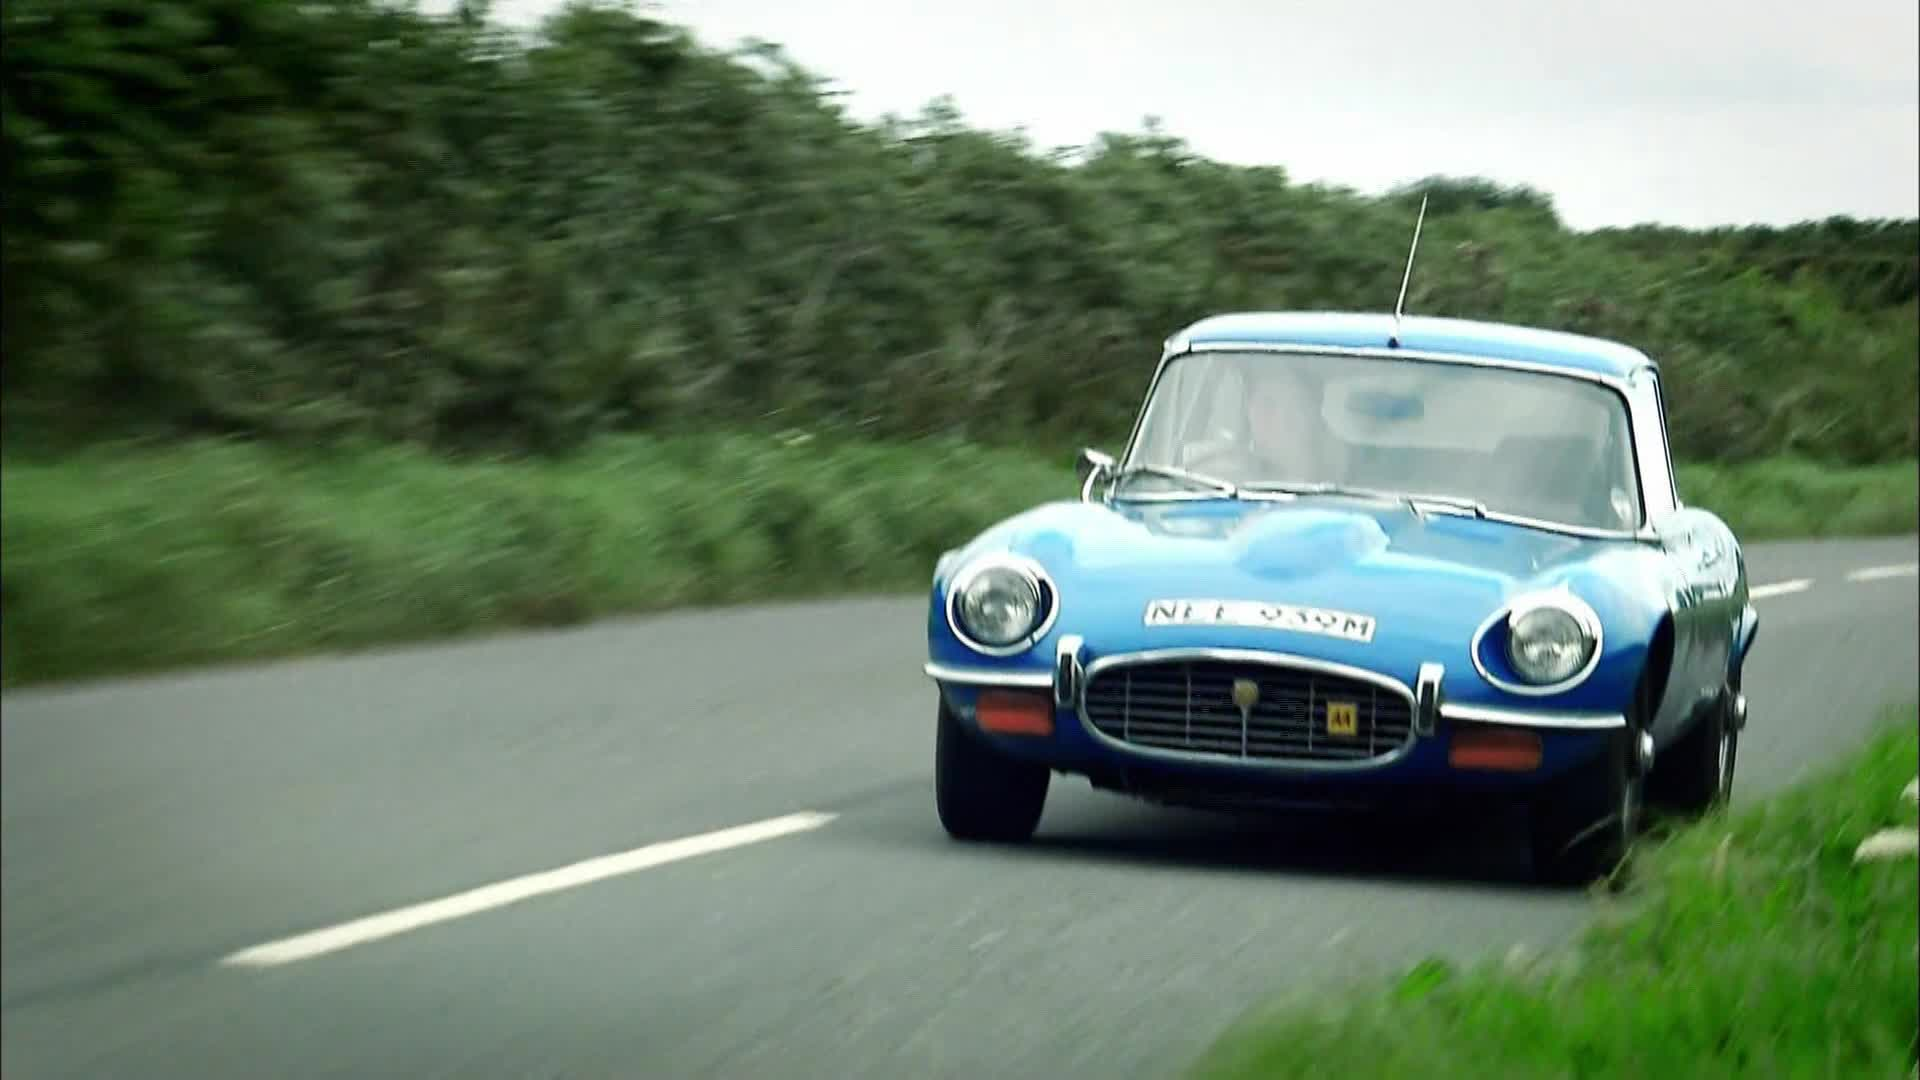 videoasset-15989-1505375592393 Cool Bmw Z1 Joyas sobre Ruedas Cars Trend